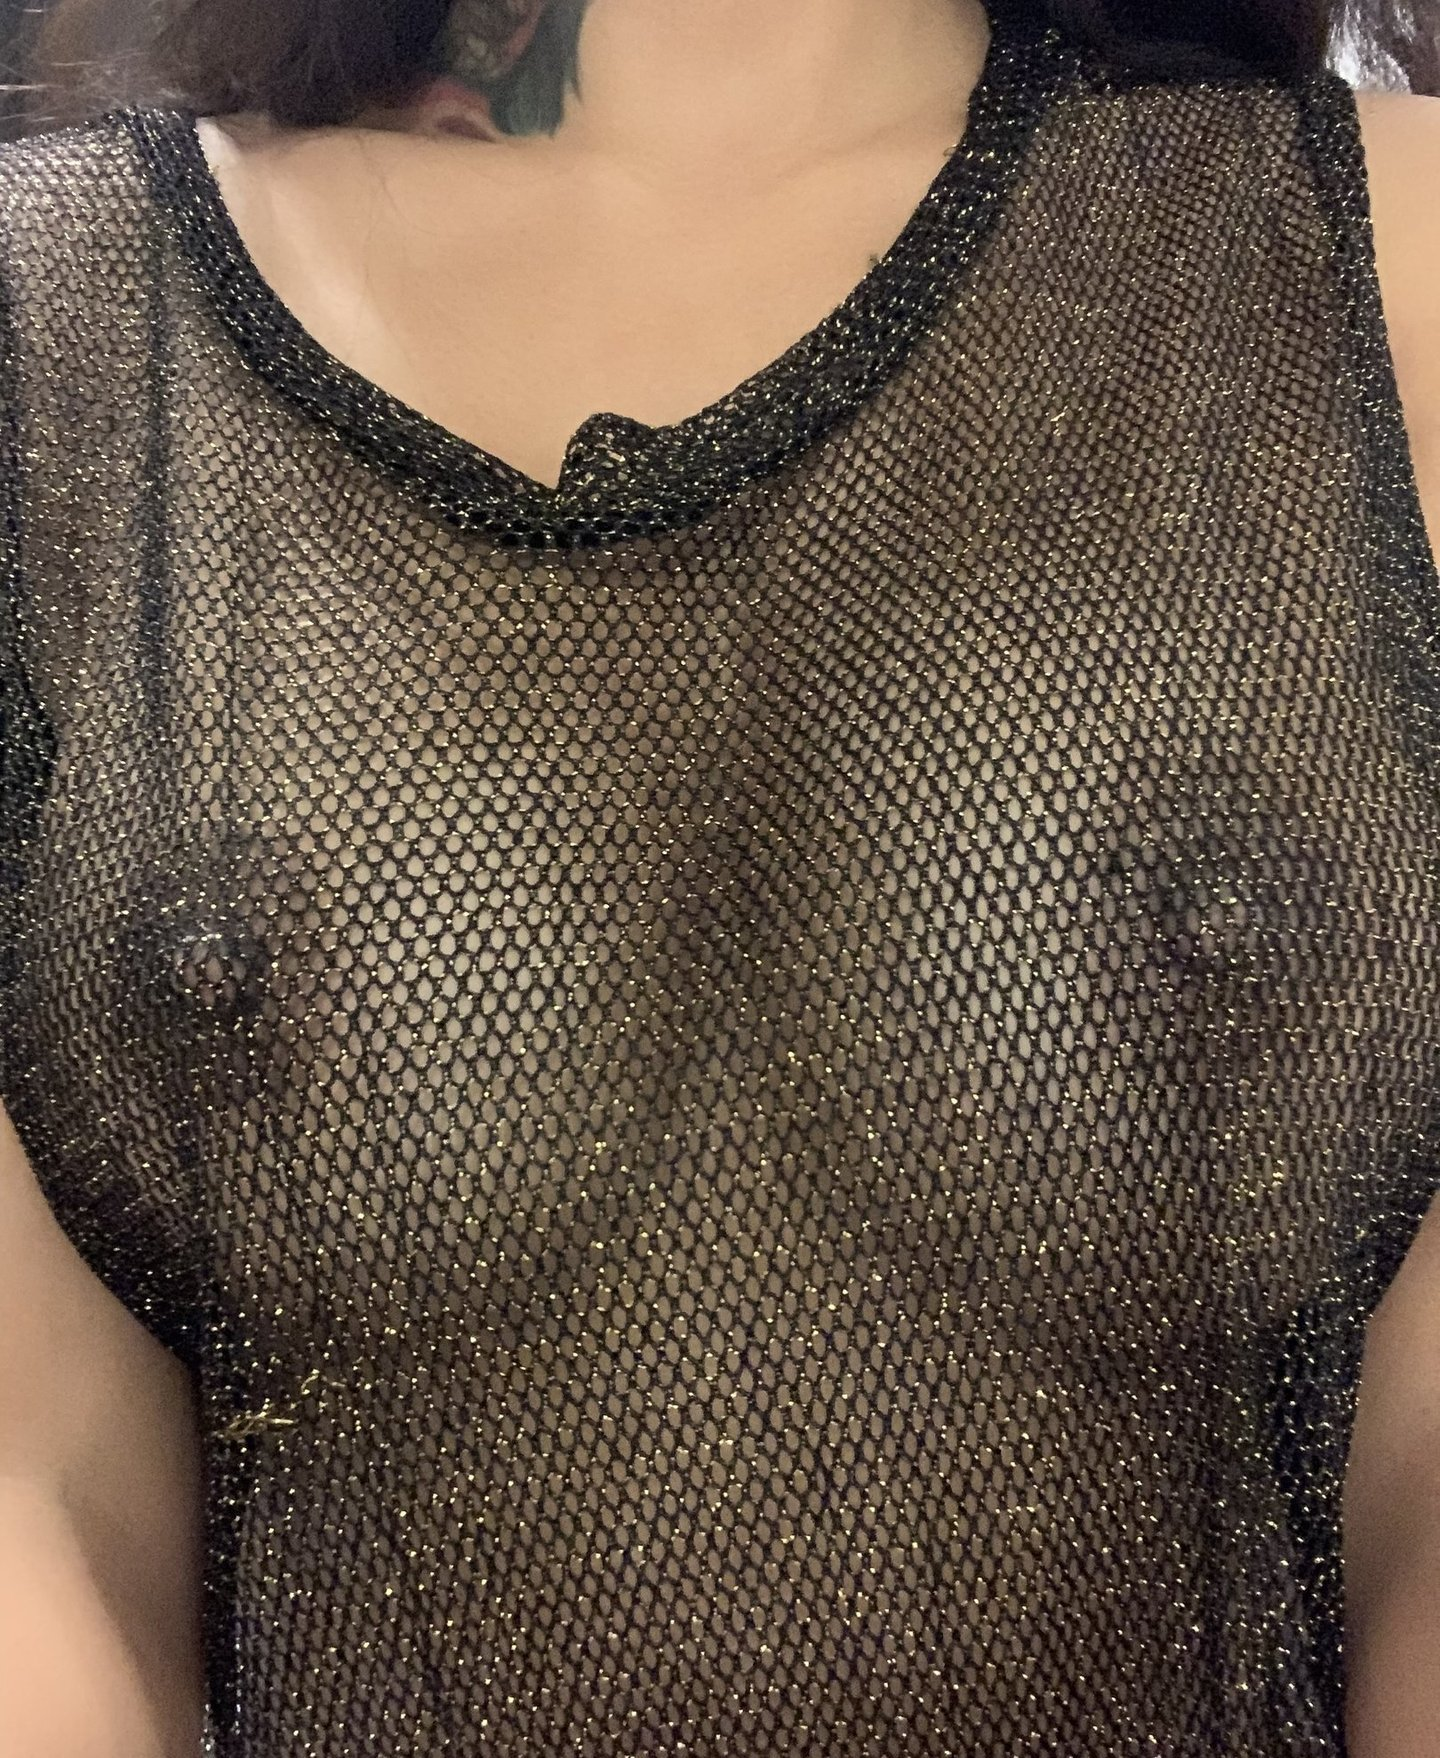 Asian Thai Girl Iampocahontas Onlyfans Nude Leaks 0017